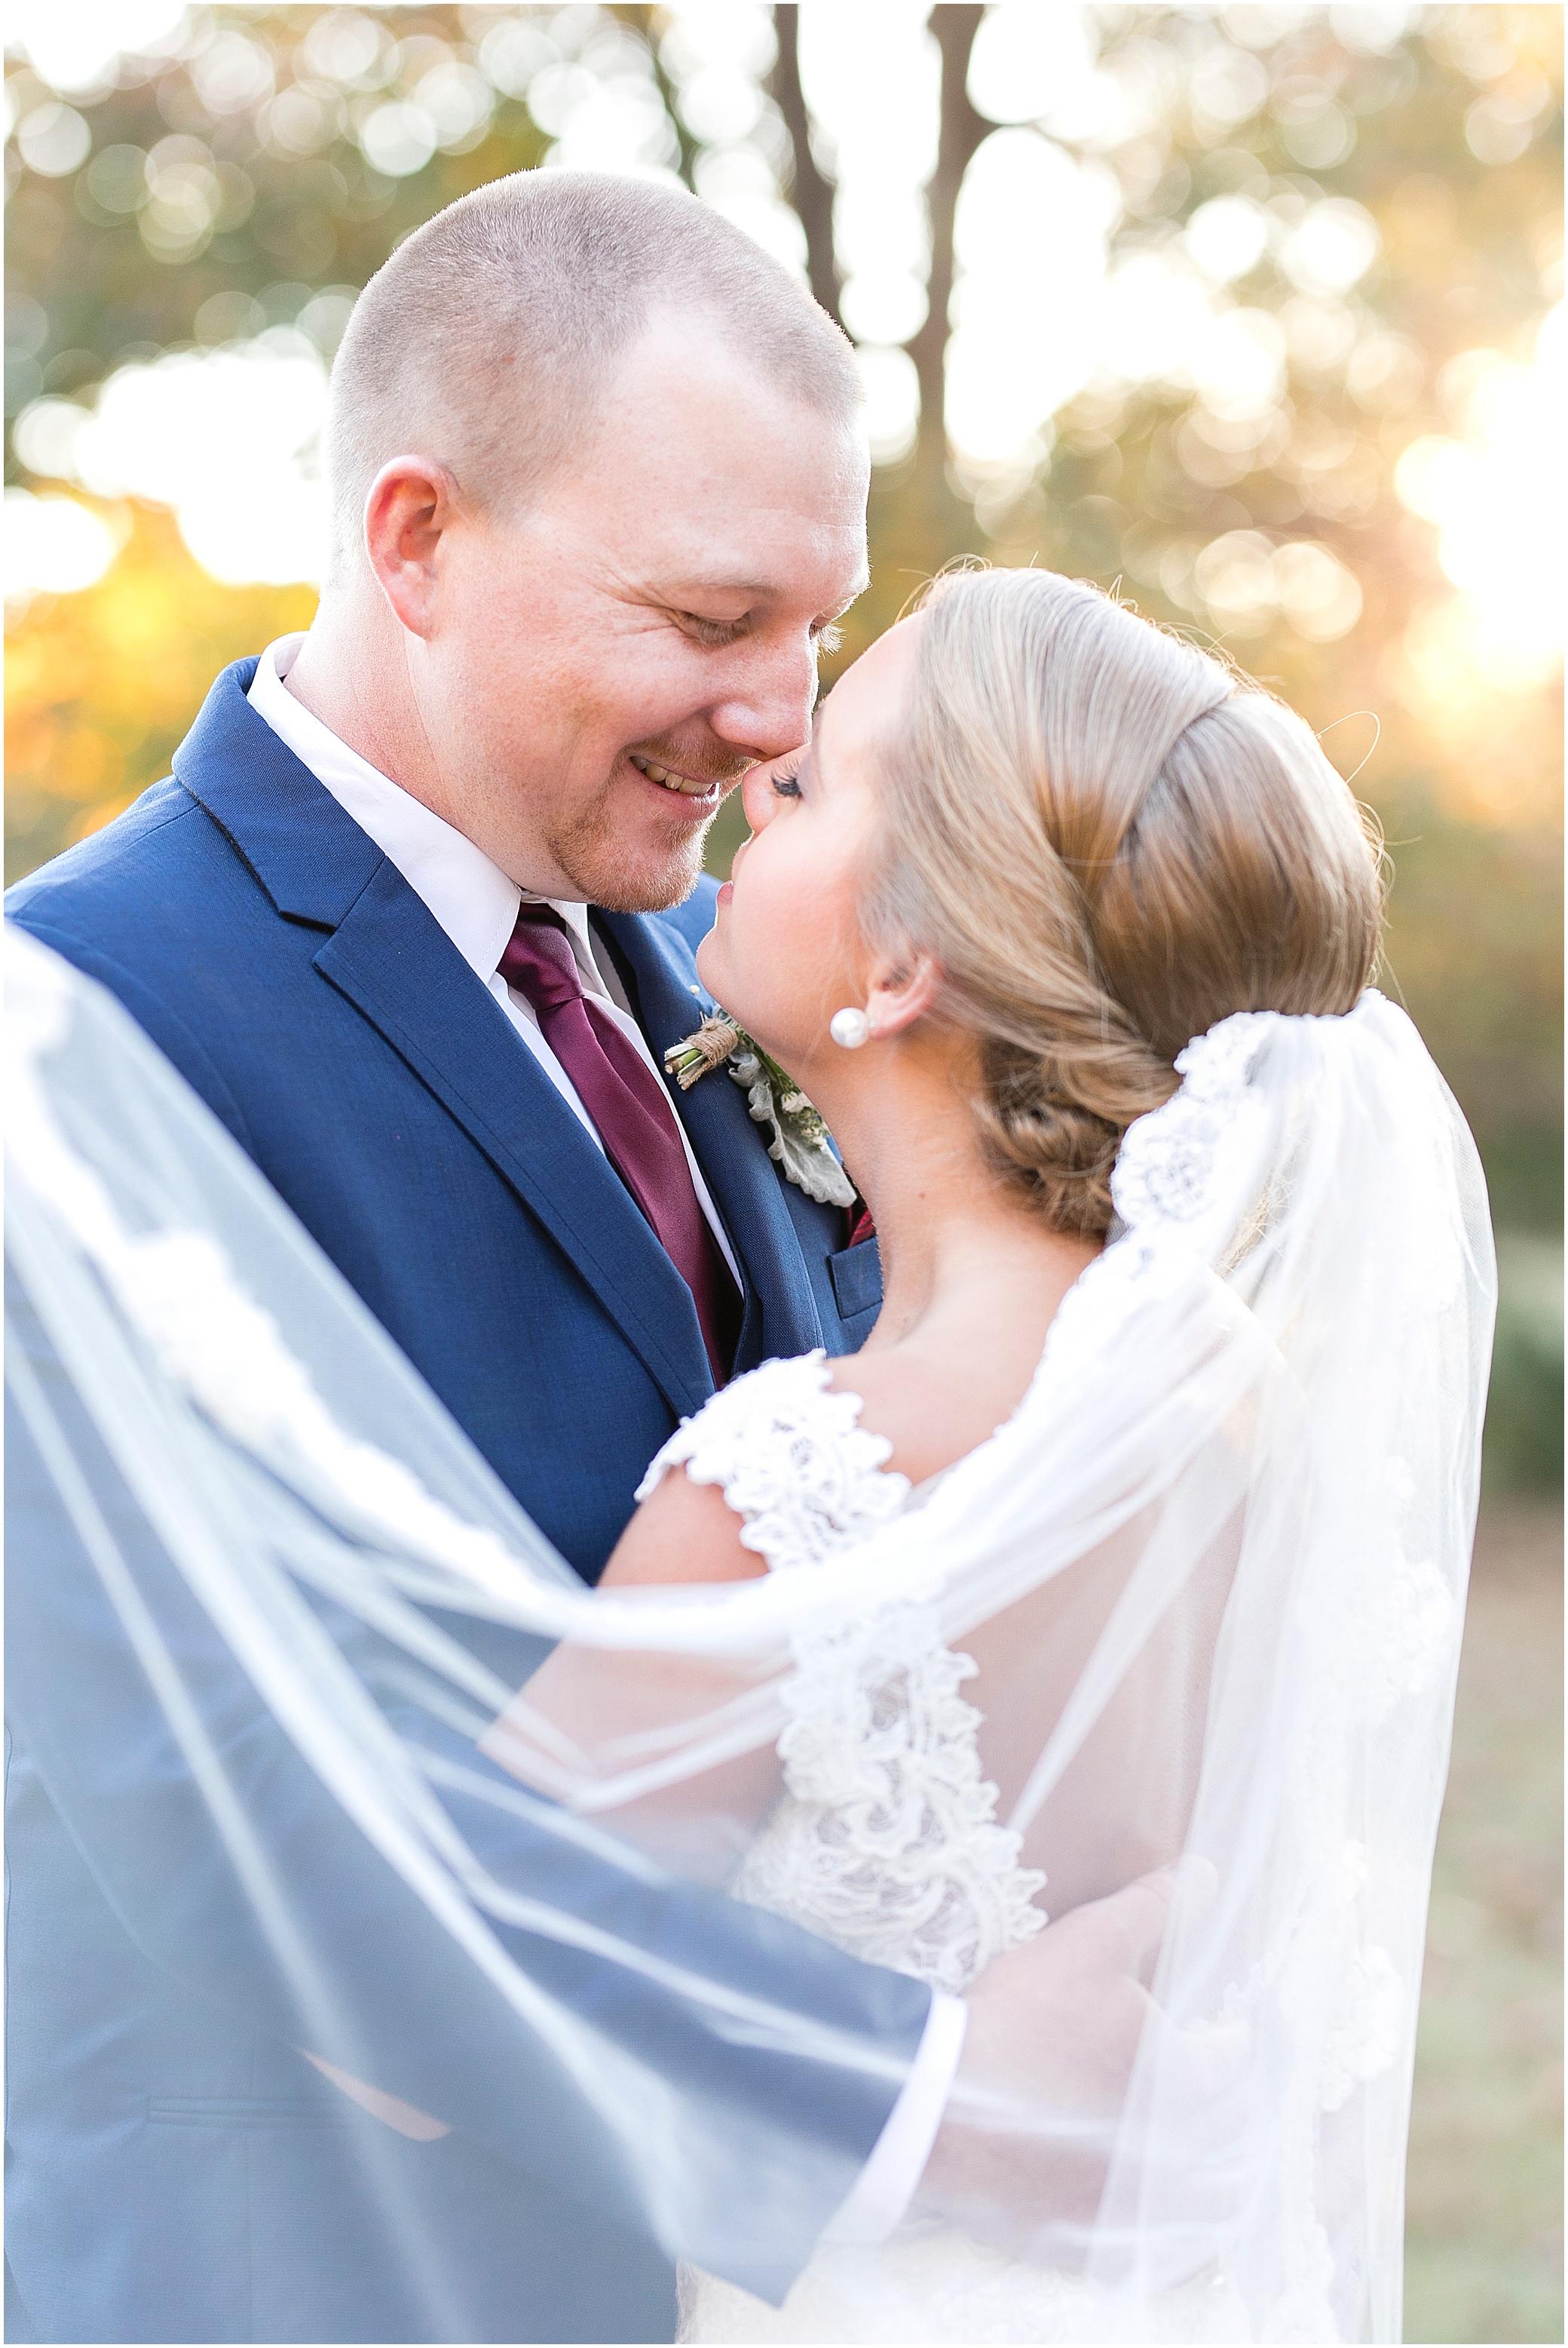 virginia wedding photography, jessica ryan photography, jessica ryan photographer,